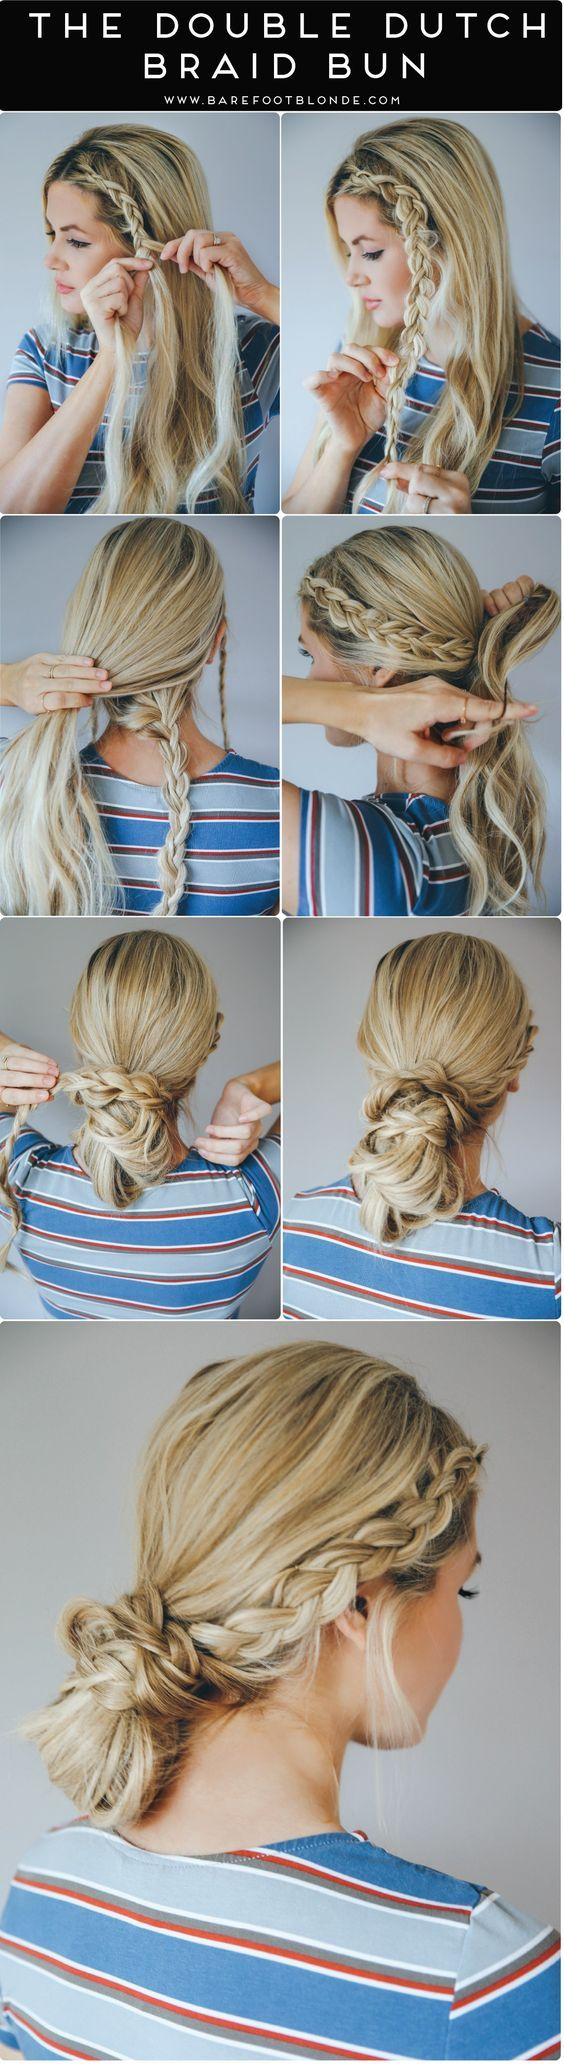 gorgeous beach hair ideas for summer beach hair hair style and